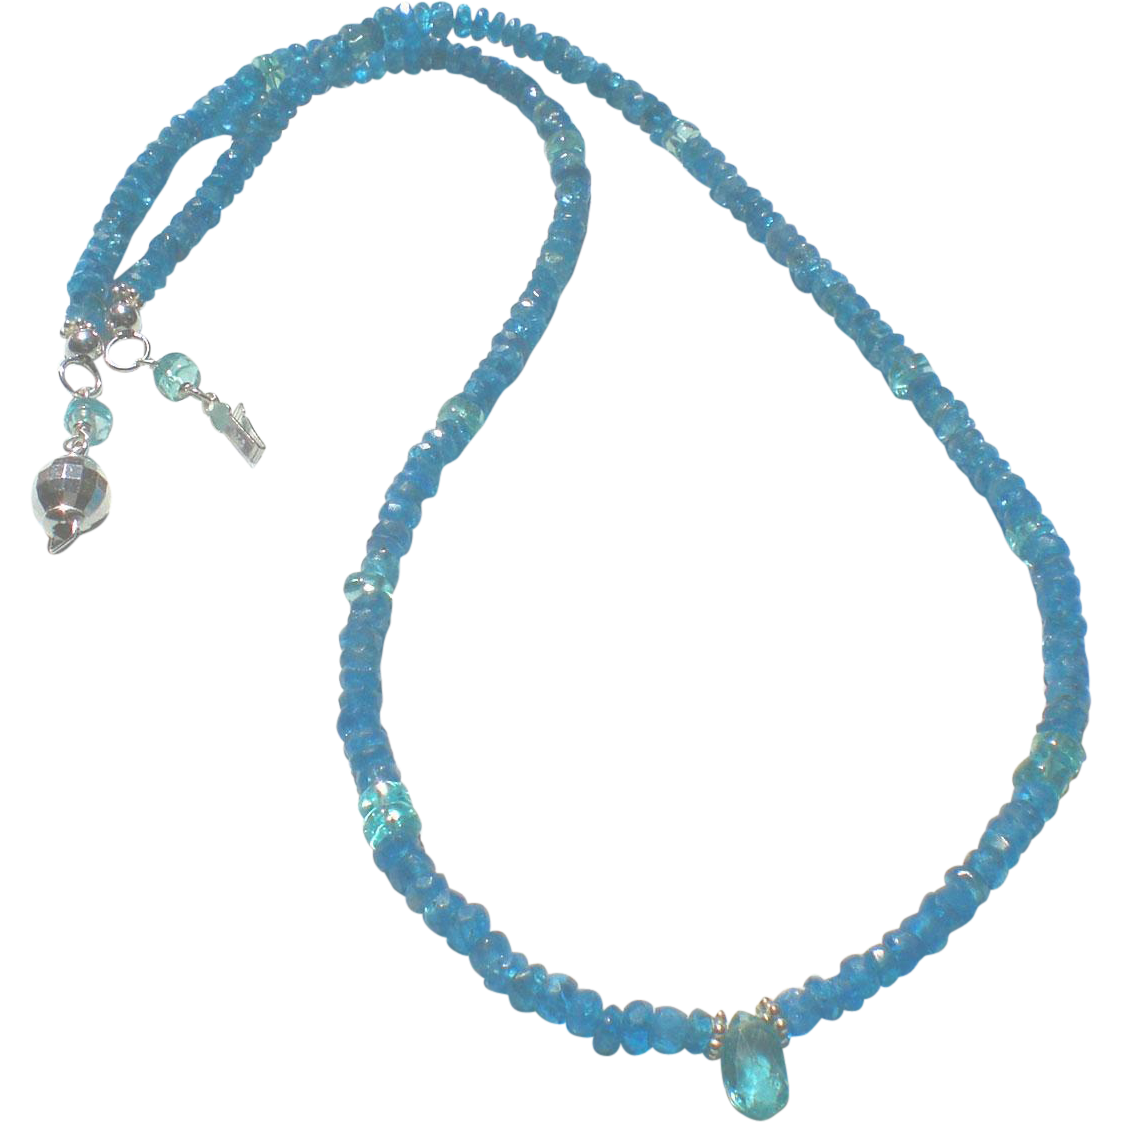 Apatite gemstone necklace sold on ruby lane for Eurasia jewelry miami fl